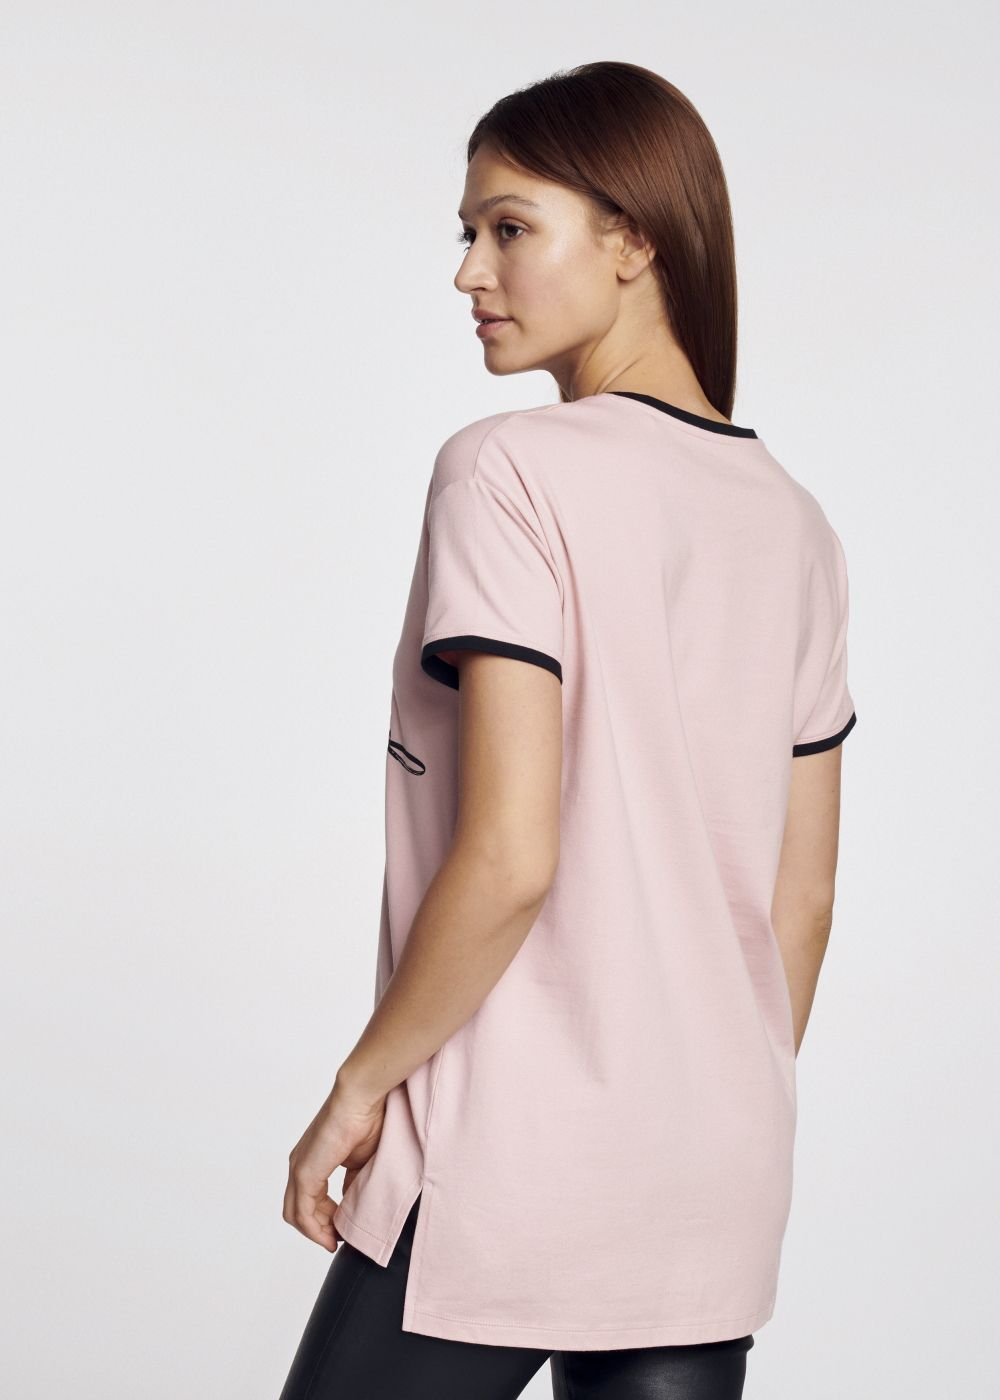 T-shirt damski TSHDT-0065-31(W21)